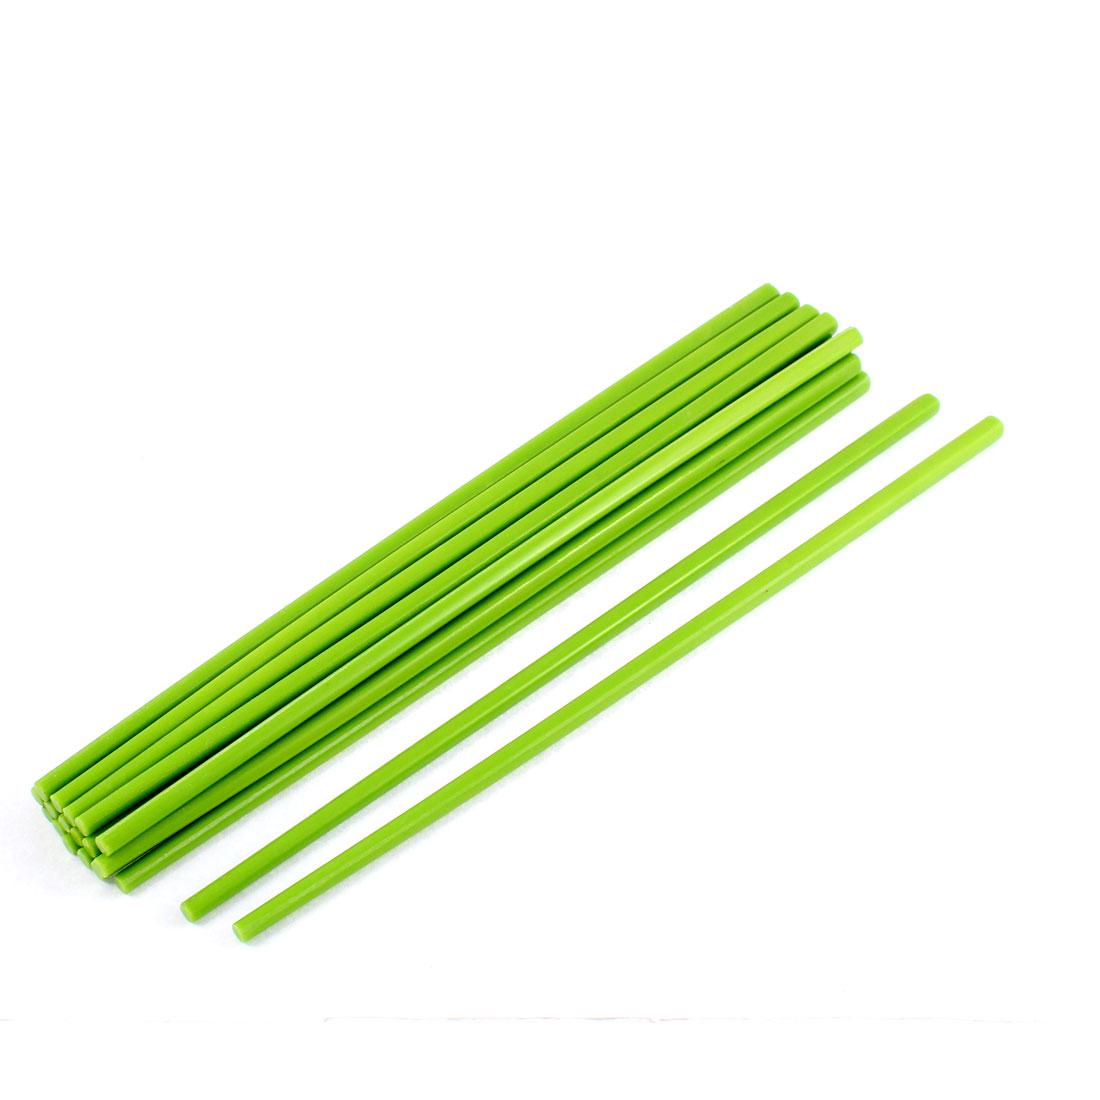 Home Tableware Dinner Plastic Chopsticks Green 10 Pairs